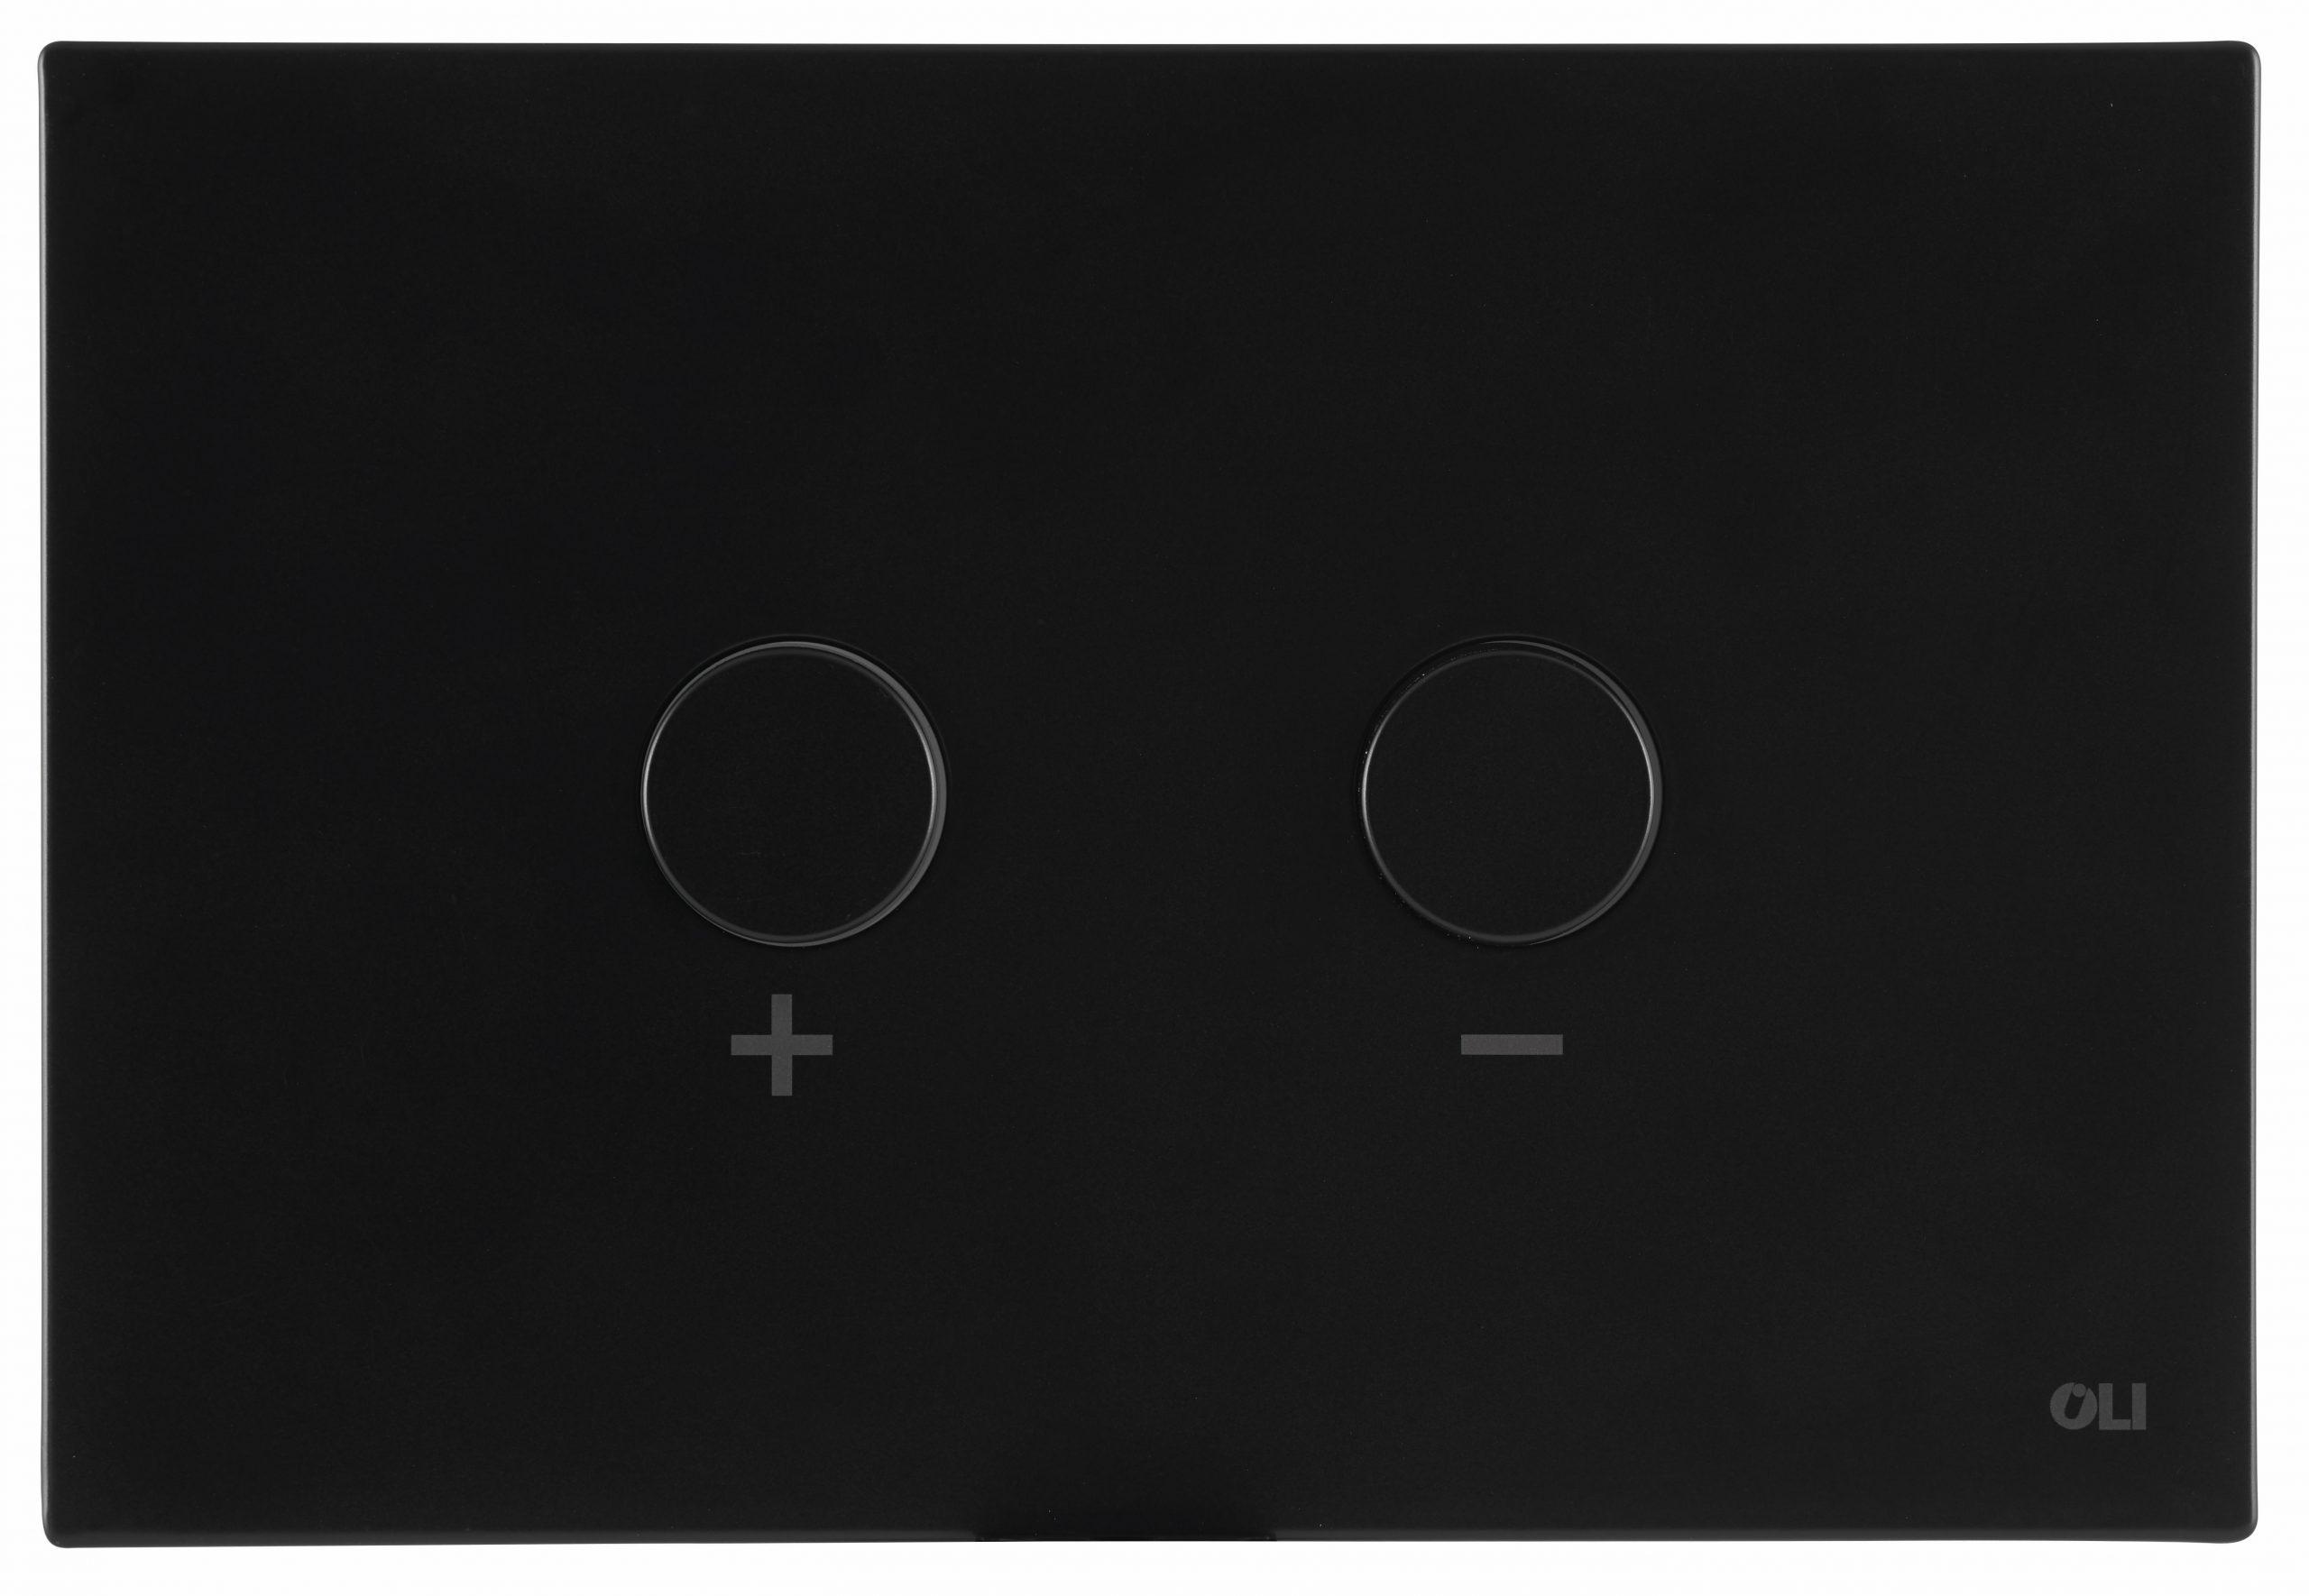 Vos Toilet Frame with Button Matt Black